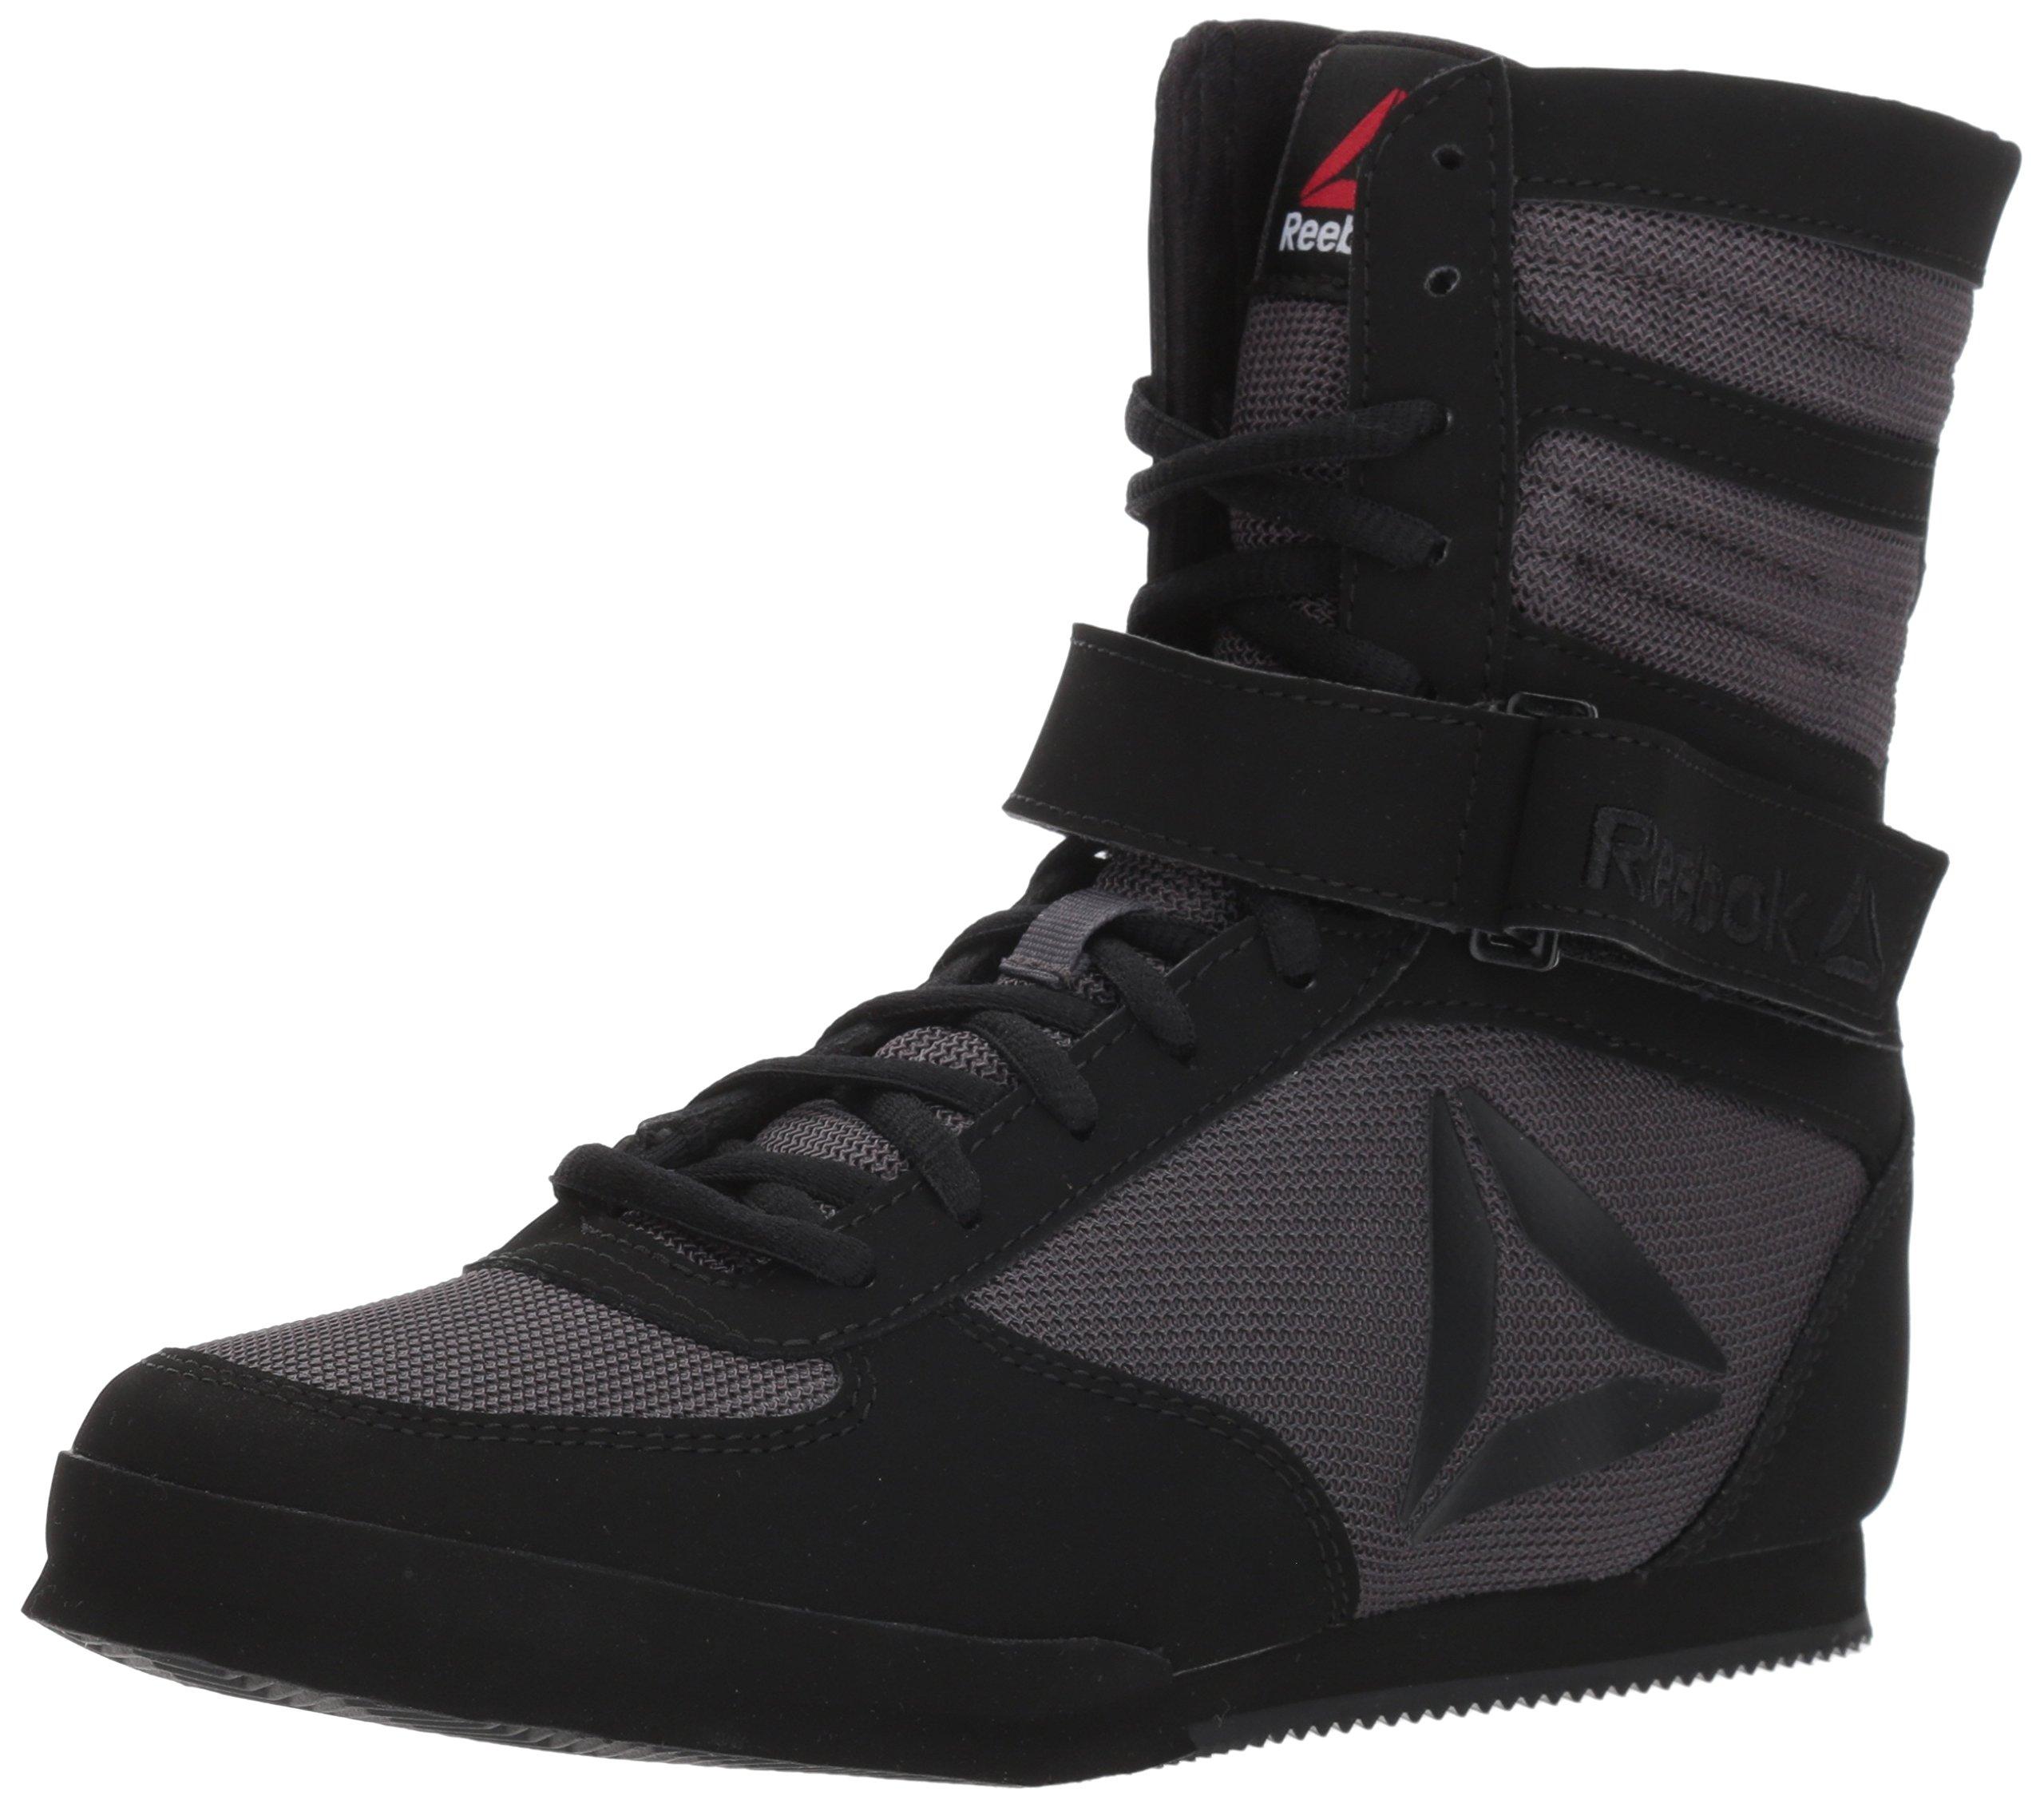 Fuera entusiasmo límite  Reebok Men's Boxing Boot-Buck Sneaker - Boxing914.com